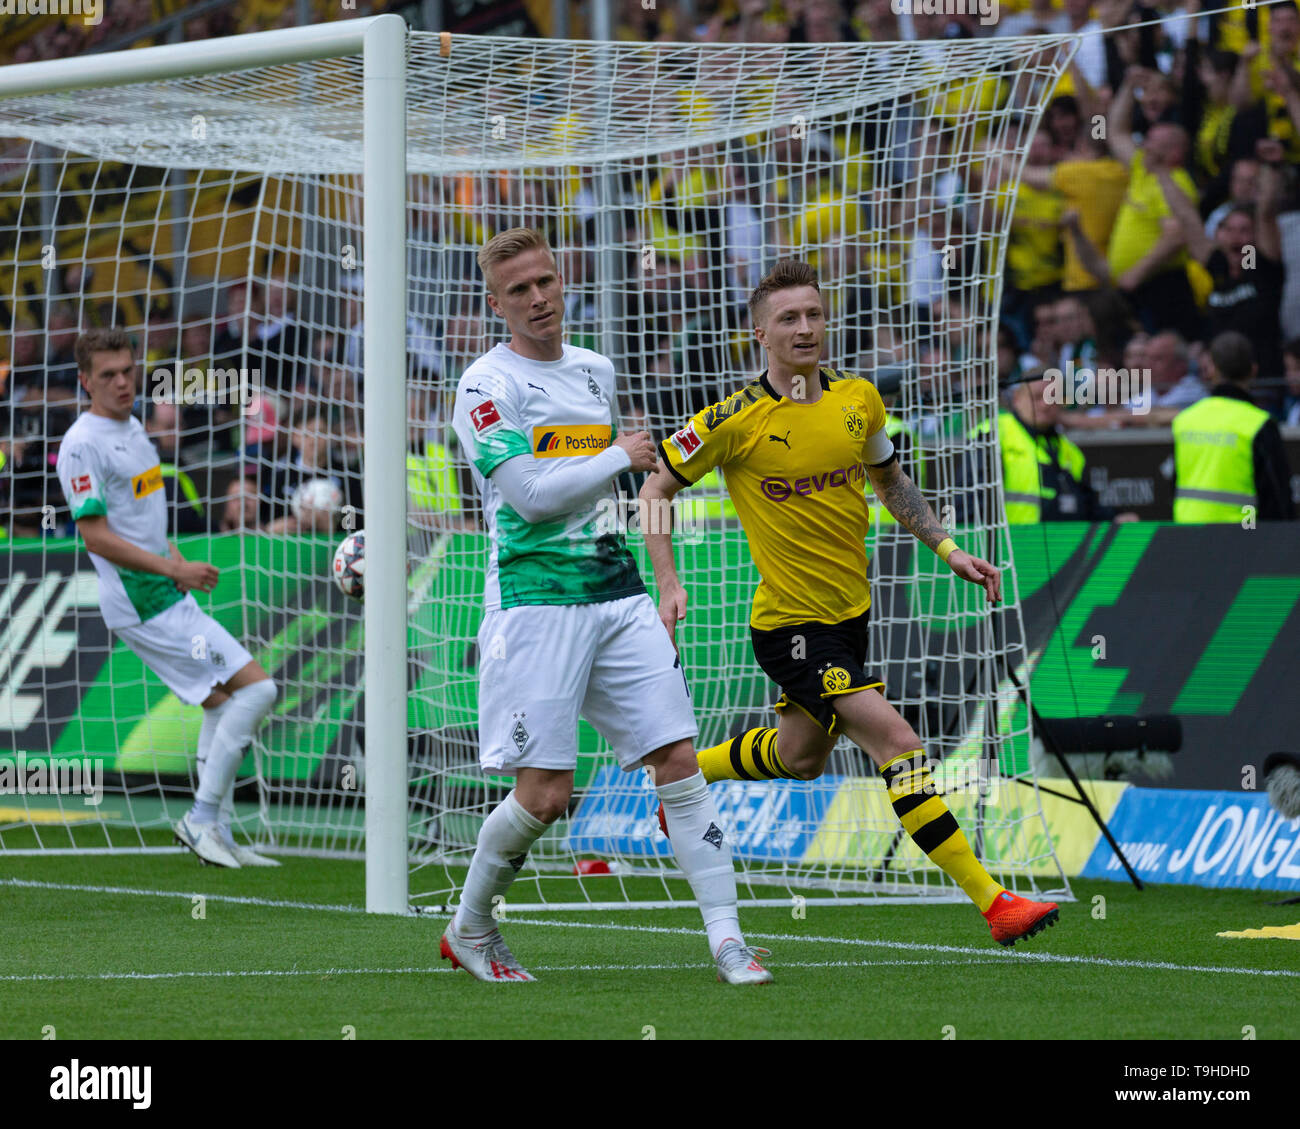 Sport, Fussball, Bundesliga, 2018/2019, Borussia Moenchengladbach vs. BVB Borussia Dortmund 0-2, Stadion Borussia-Park, Torjubel nach dem 0-2, v.l.n.r. Matthias Ginter (MG), Oscar Wendt (MG), Torschuetze Marco Reus (BVB), DFL REGULATIONS PROHIBIT ANY USE OF PHOTOGRAPHS AS IMAGE SEQUENCES AND/OR QUASI-VIDEO, sports, football, Bundesliga, 2018/2019, Borussia Moenchengladbach vs. BVB Borussia Dortmund 0-2, Stadium Borussia Park, rejoicing at the 0-2 goal, f.l.t.r. Matthias Ginter (MG), Oscar Wendt (MG), goal scorer Marco Reus (BVB), DFL REGULATIONS PROHIBIT ANY USE OF PHOTOGRAPHS AS IMAGE SEQUENC - Stock Image